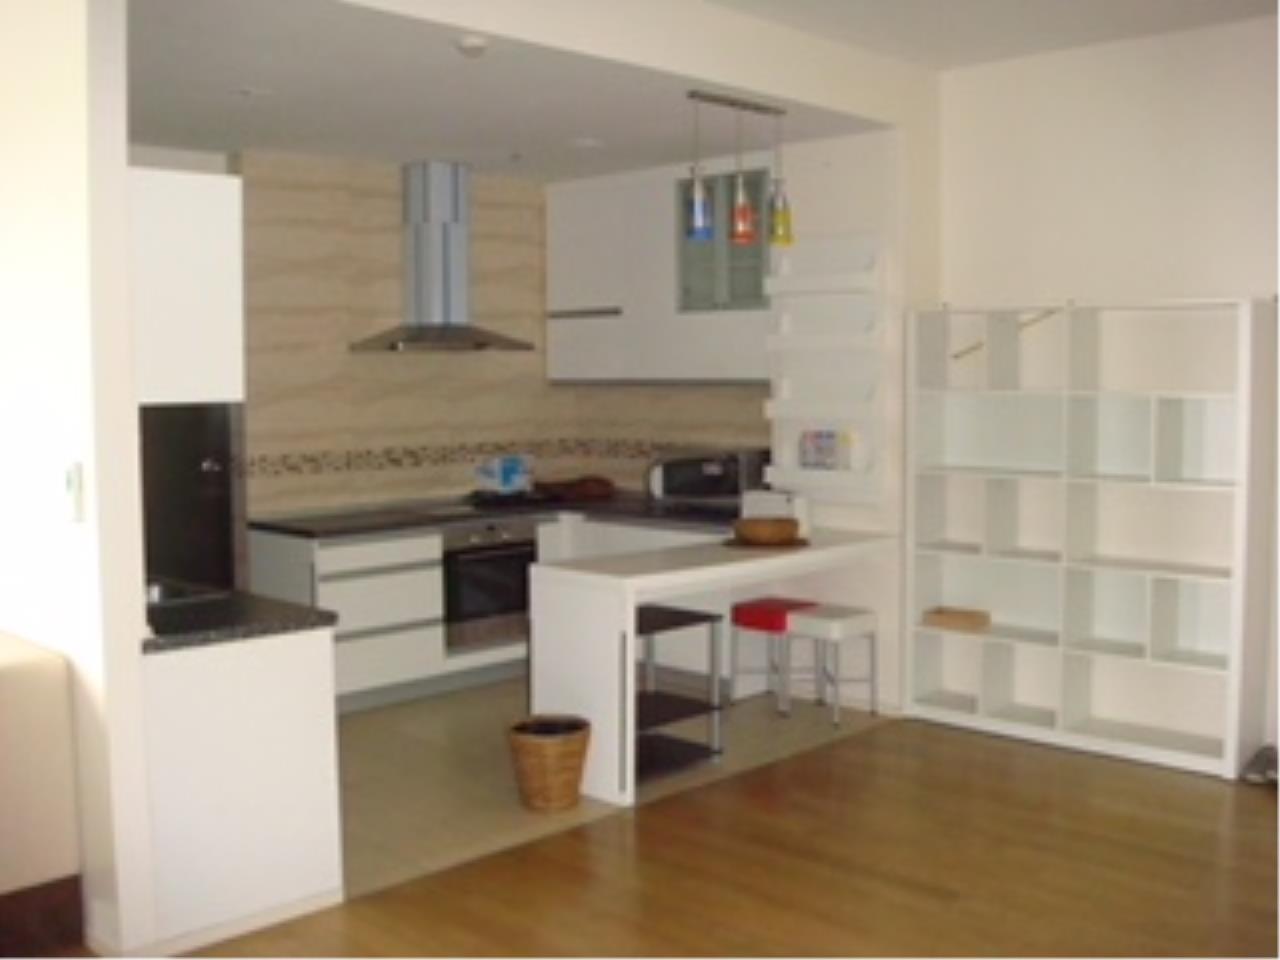 Right Move Thailand Agency's CA5486 Madison Condominium For Rent 90,000 THB - 3 Bedrooms - 160 sqm. 3